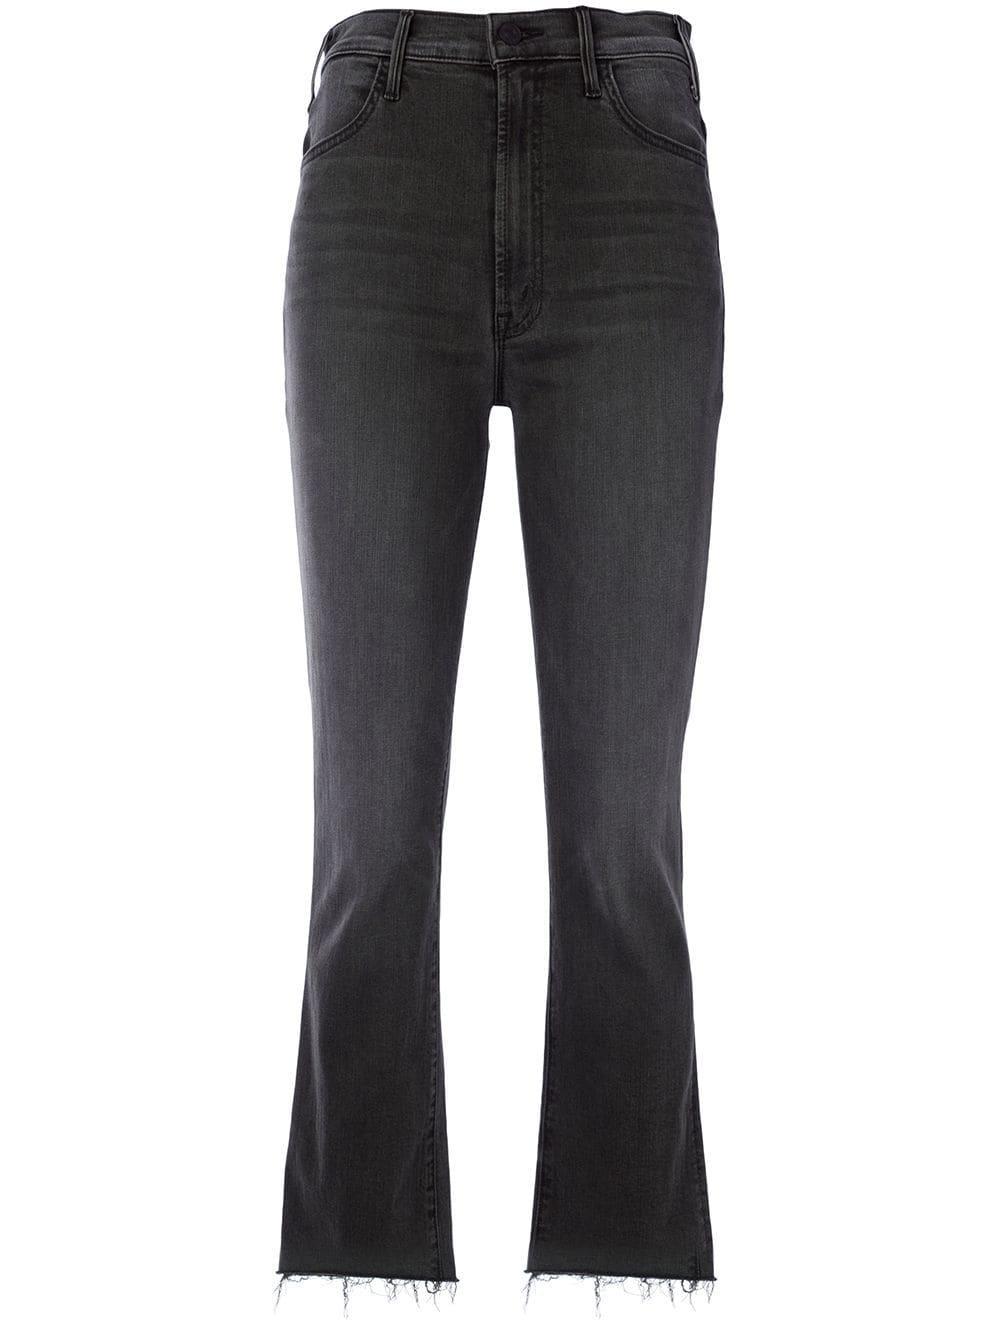 Hustler Ankle Fray Jeans